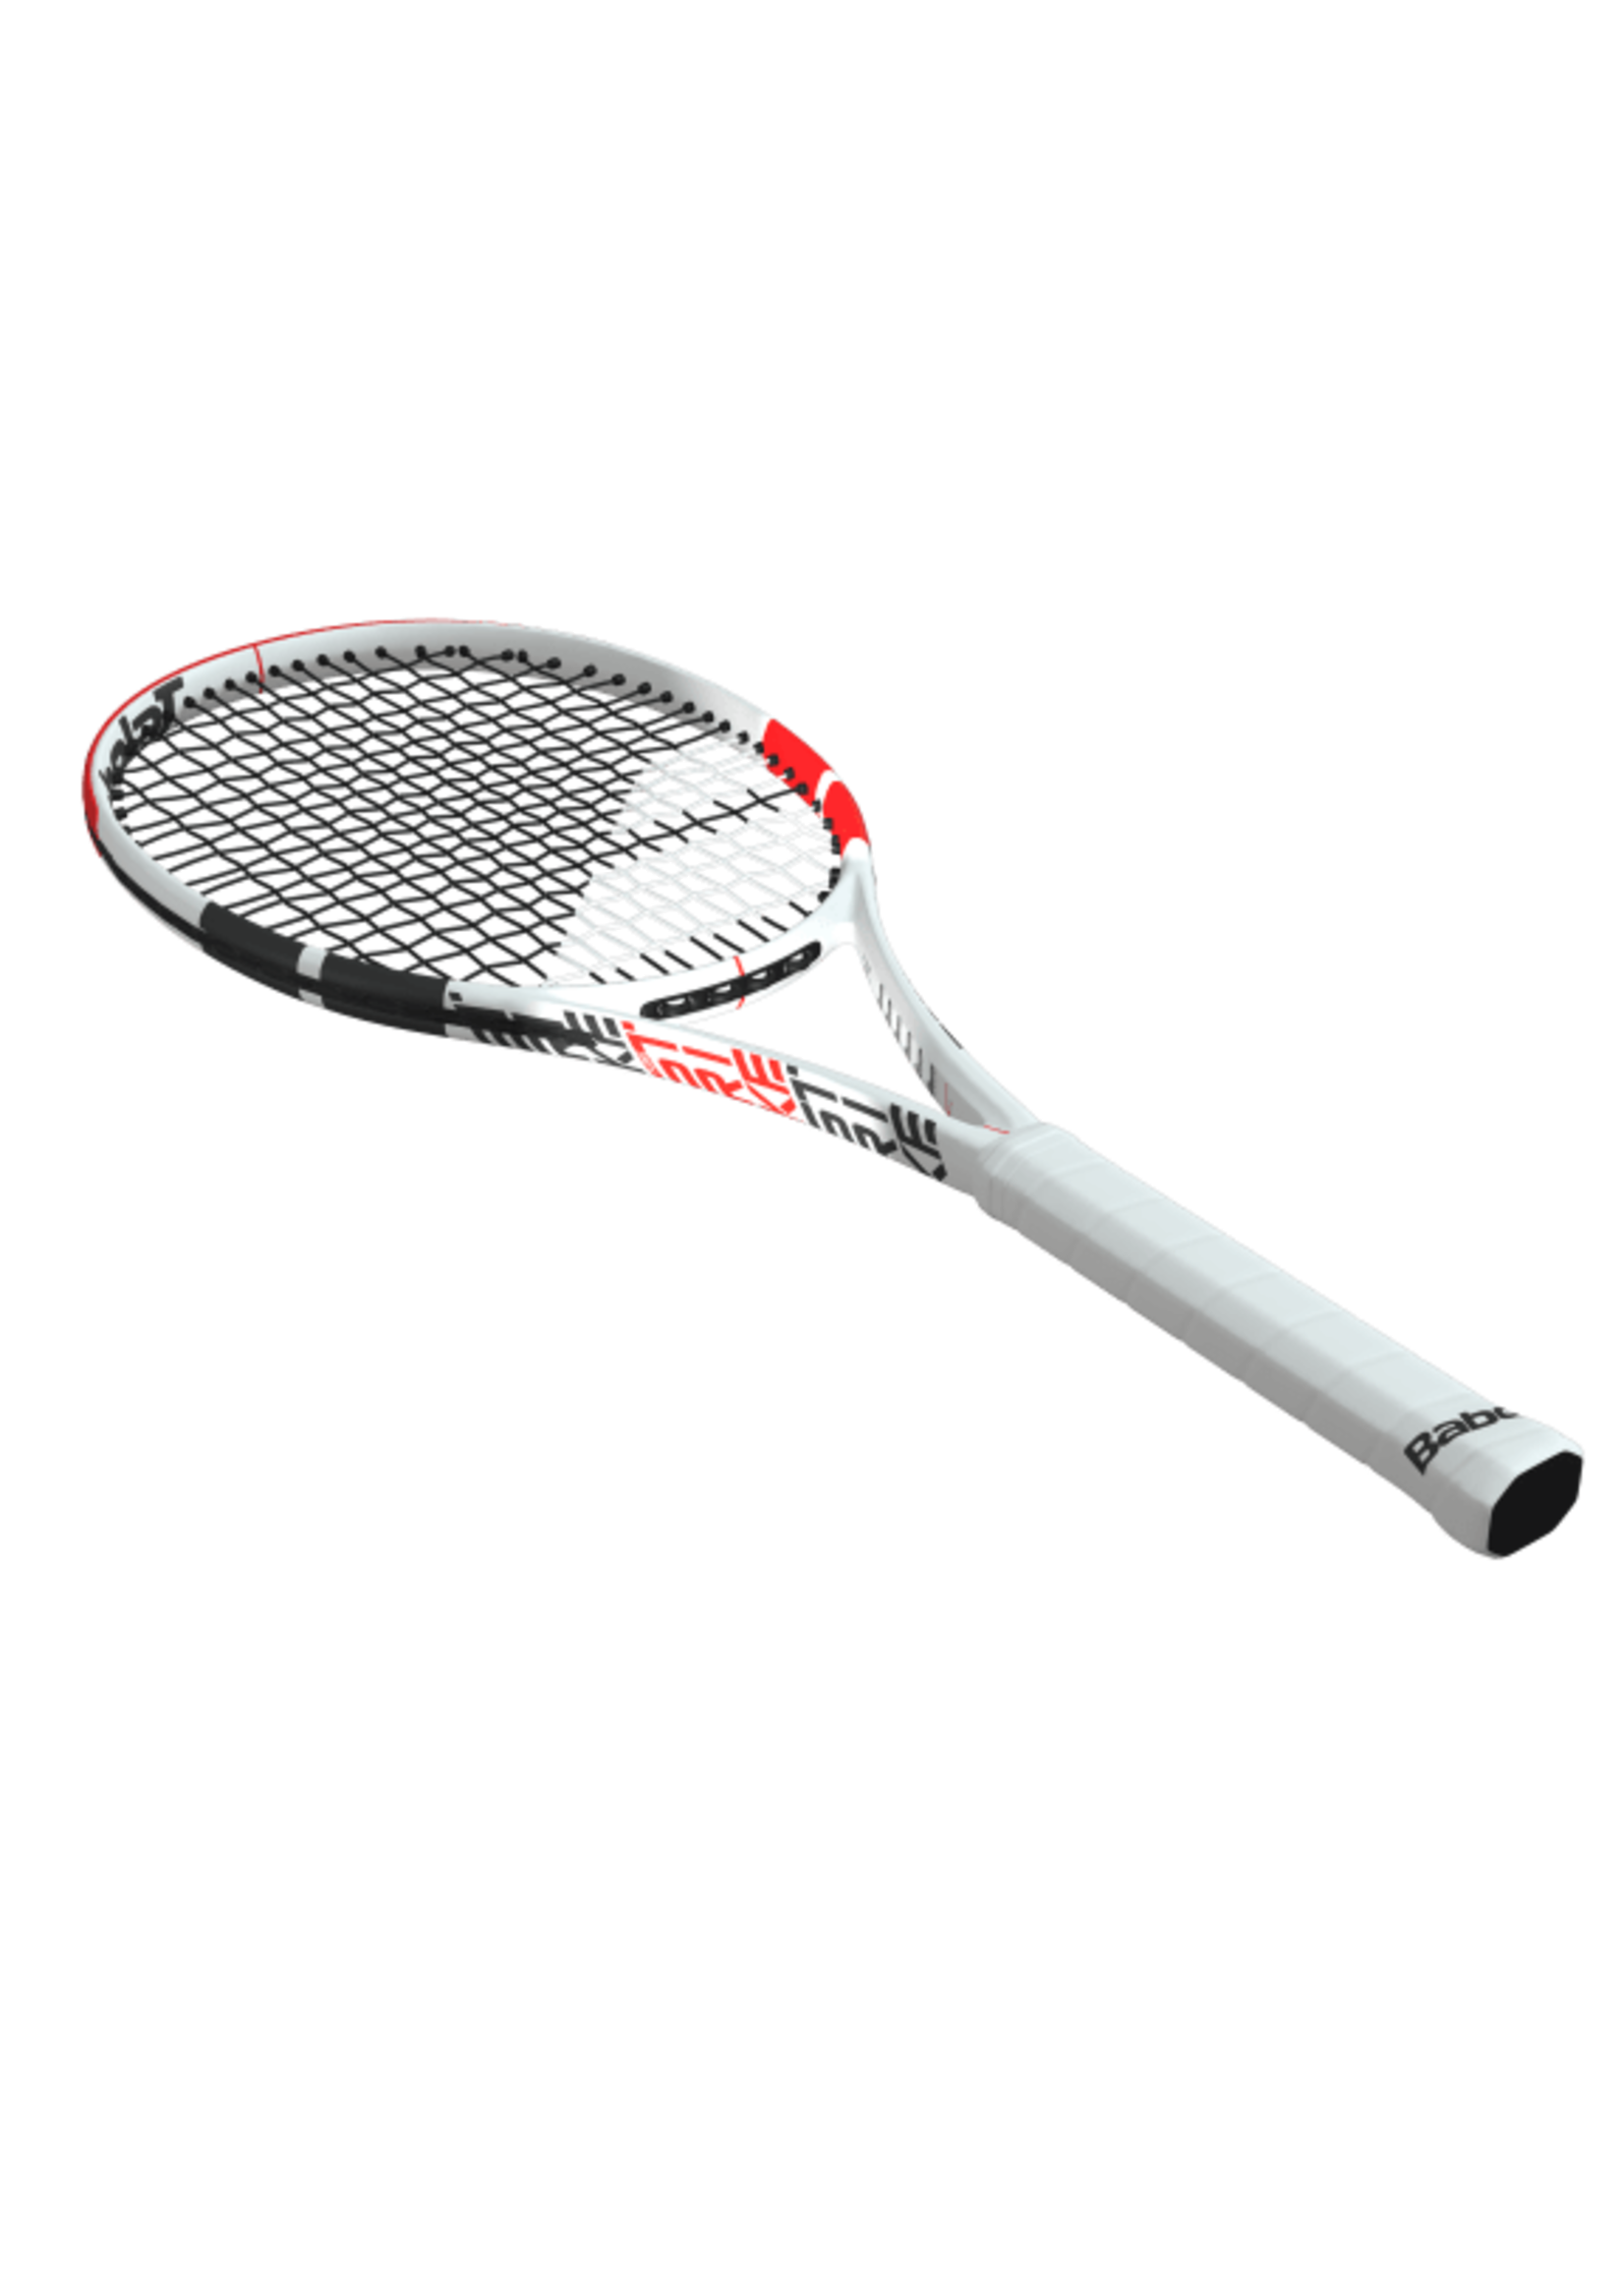 Babolat Babolat Pure Strike 16x19 Tennis Racket (2020)